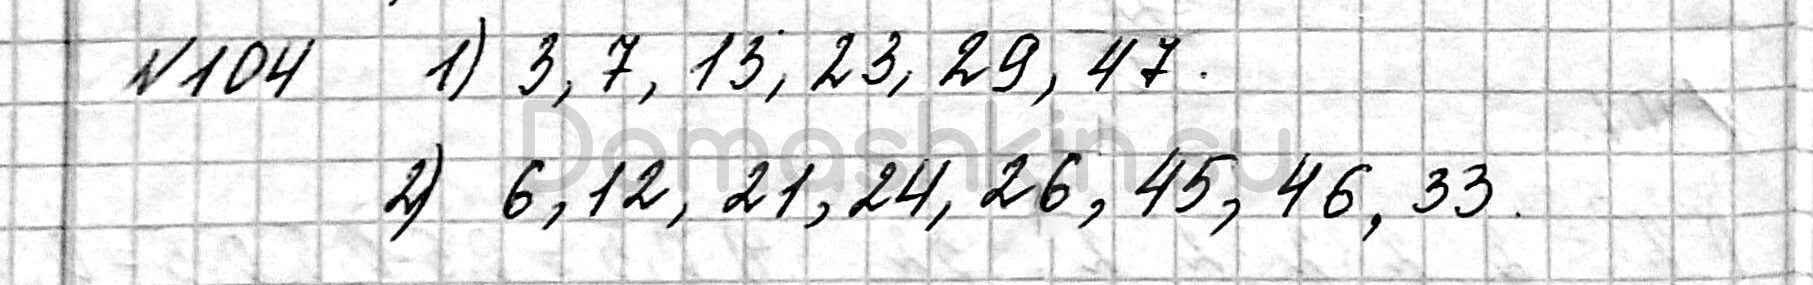 Математика 6 класс учебник Мерзляк номер 104 решение